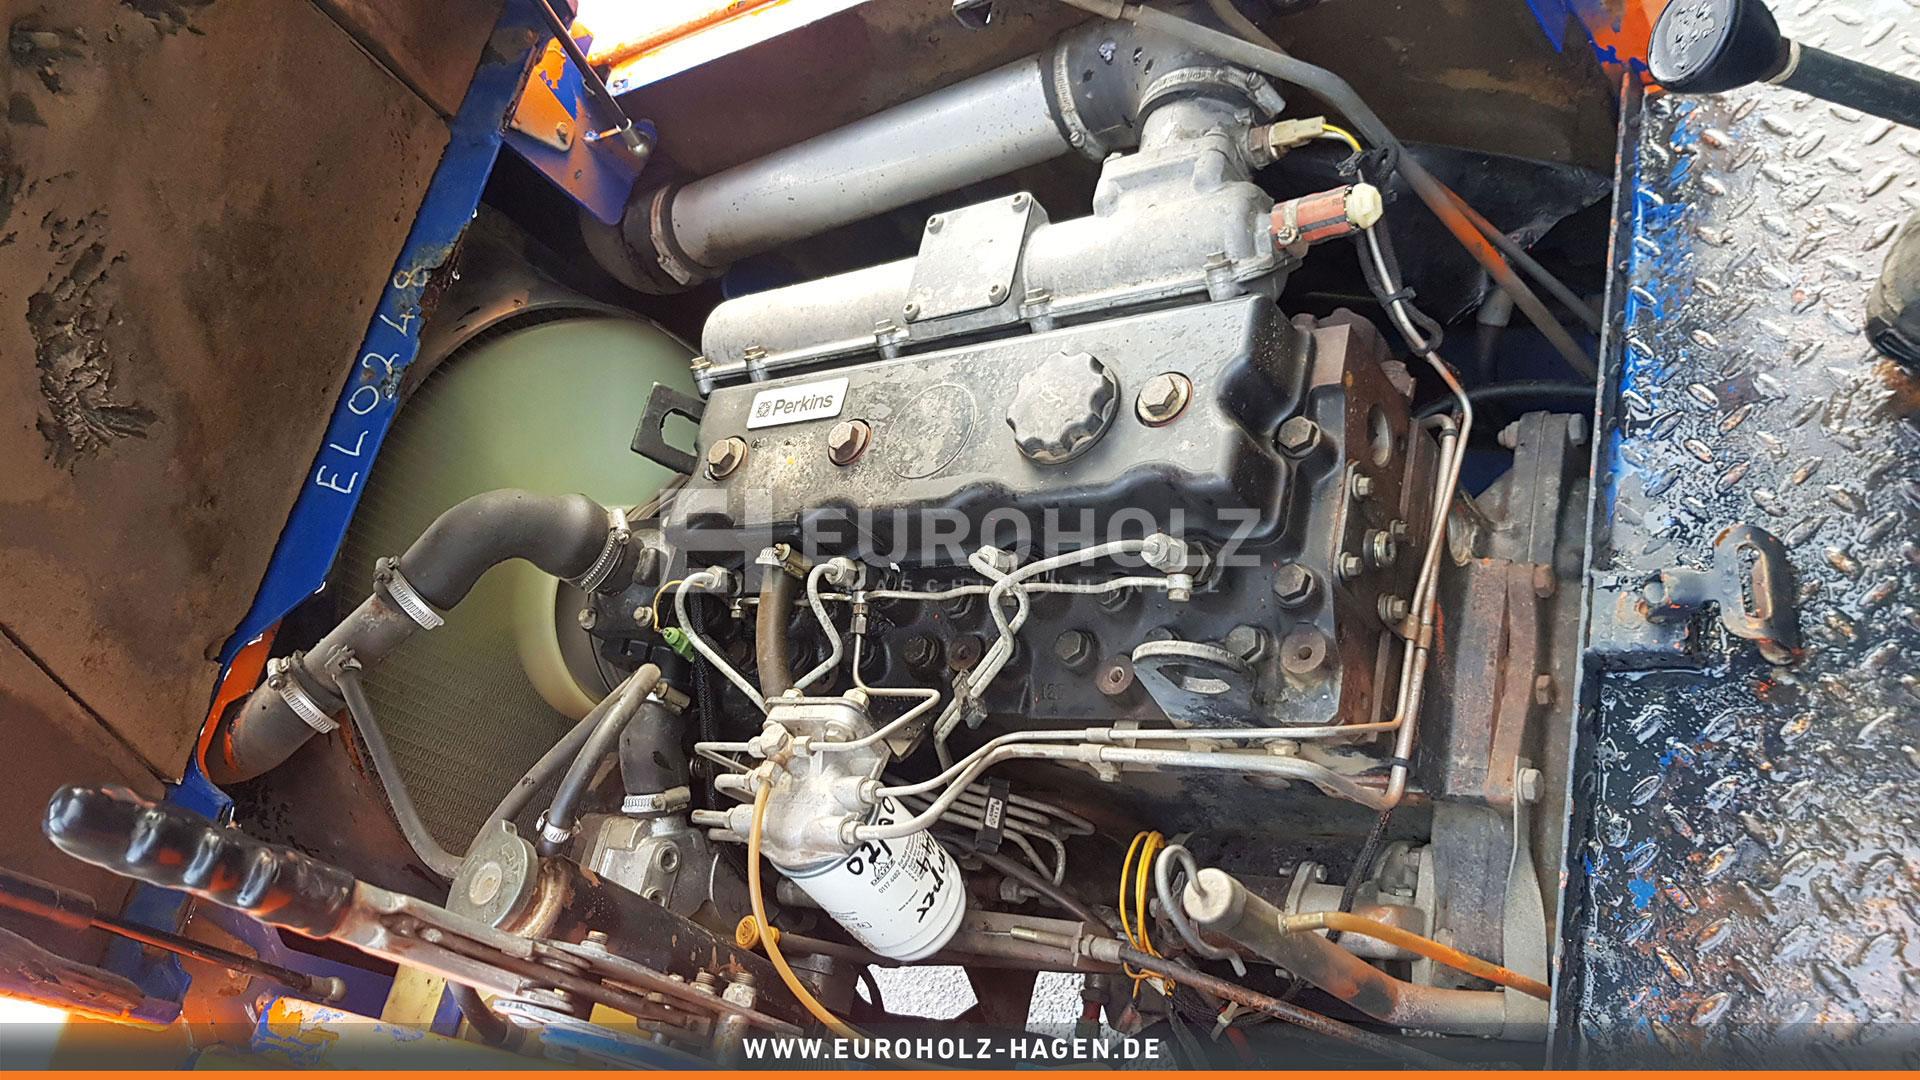 Drehkippmulde Thwaites Dumper 6 Ton Mach 166